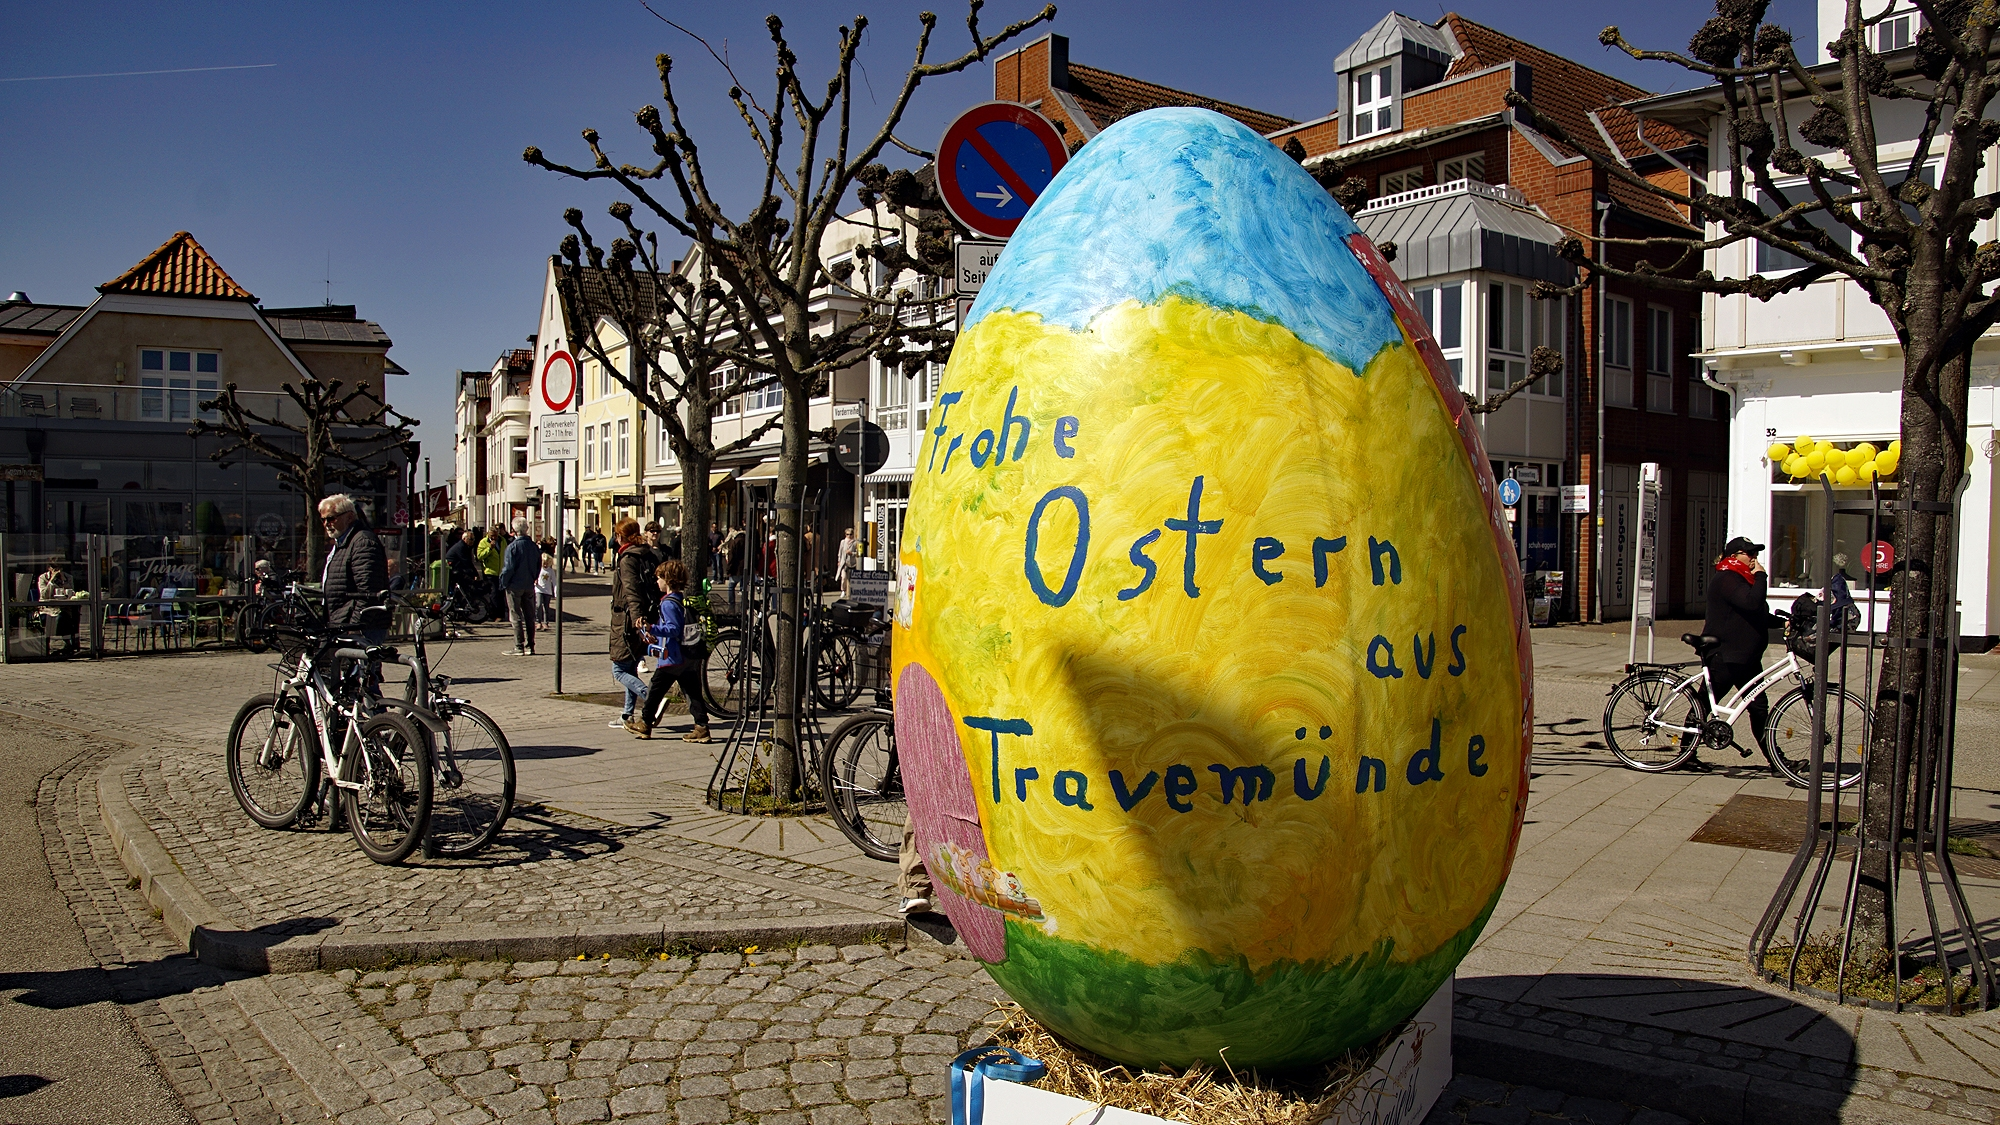 024 Ostermünde 2019Travemünde © Travemedia